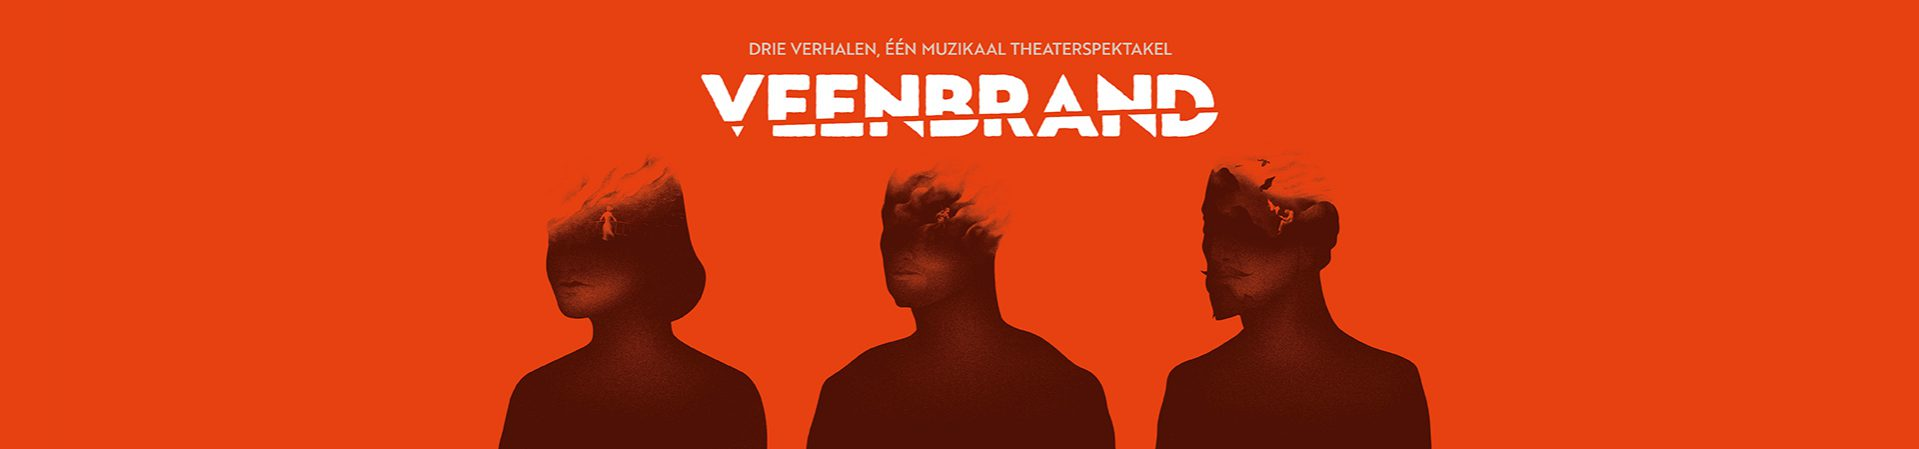 Veenbrand 2020 online tickets